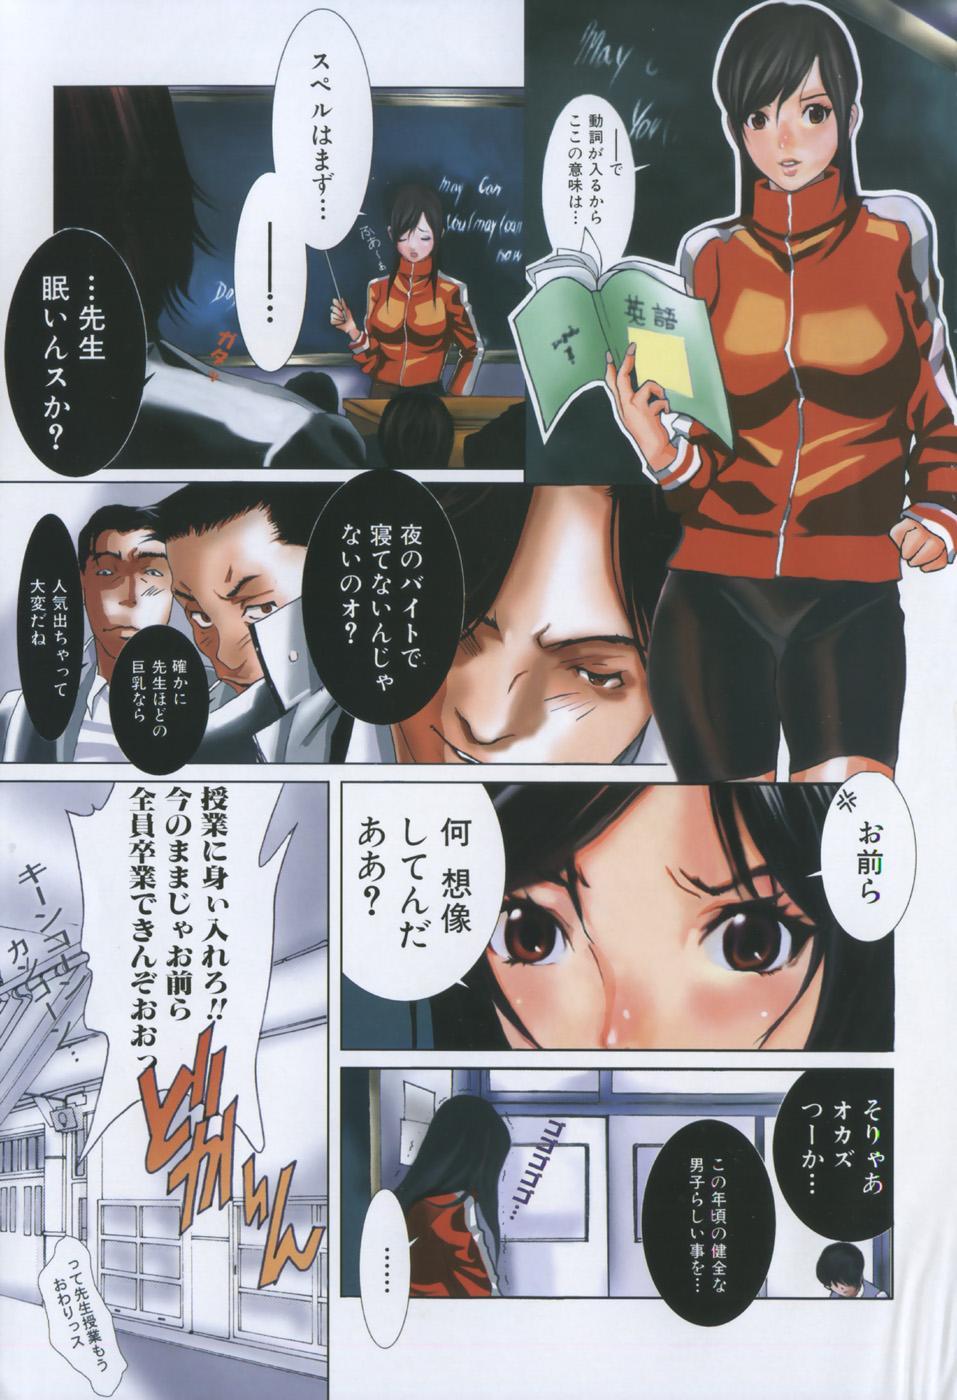 Honki Jiru - Cowper's Gland Liquid? or Love Juice?...?! 3